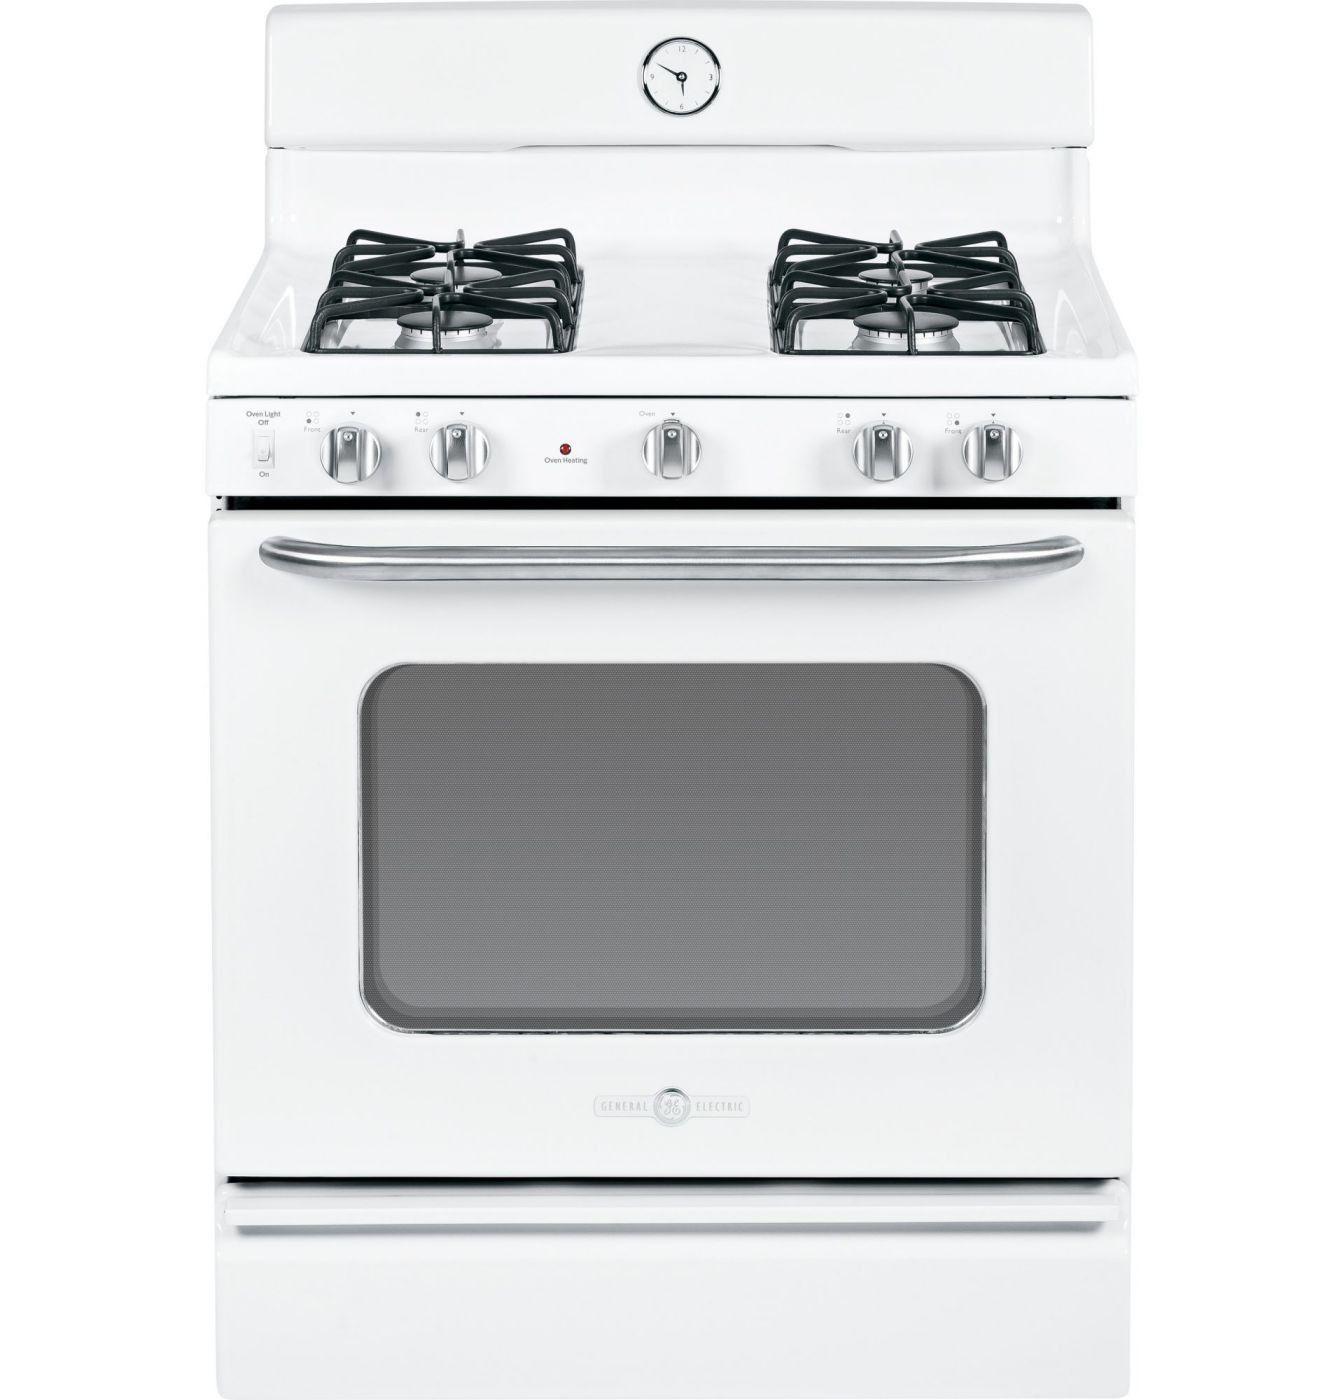 Ge Agbs45defws Under Mountain Oven Range Kitchen